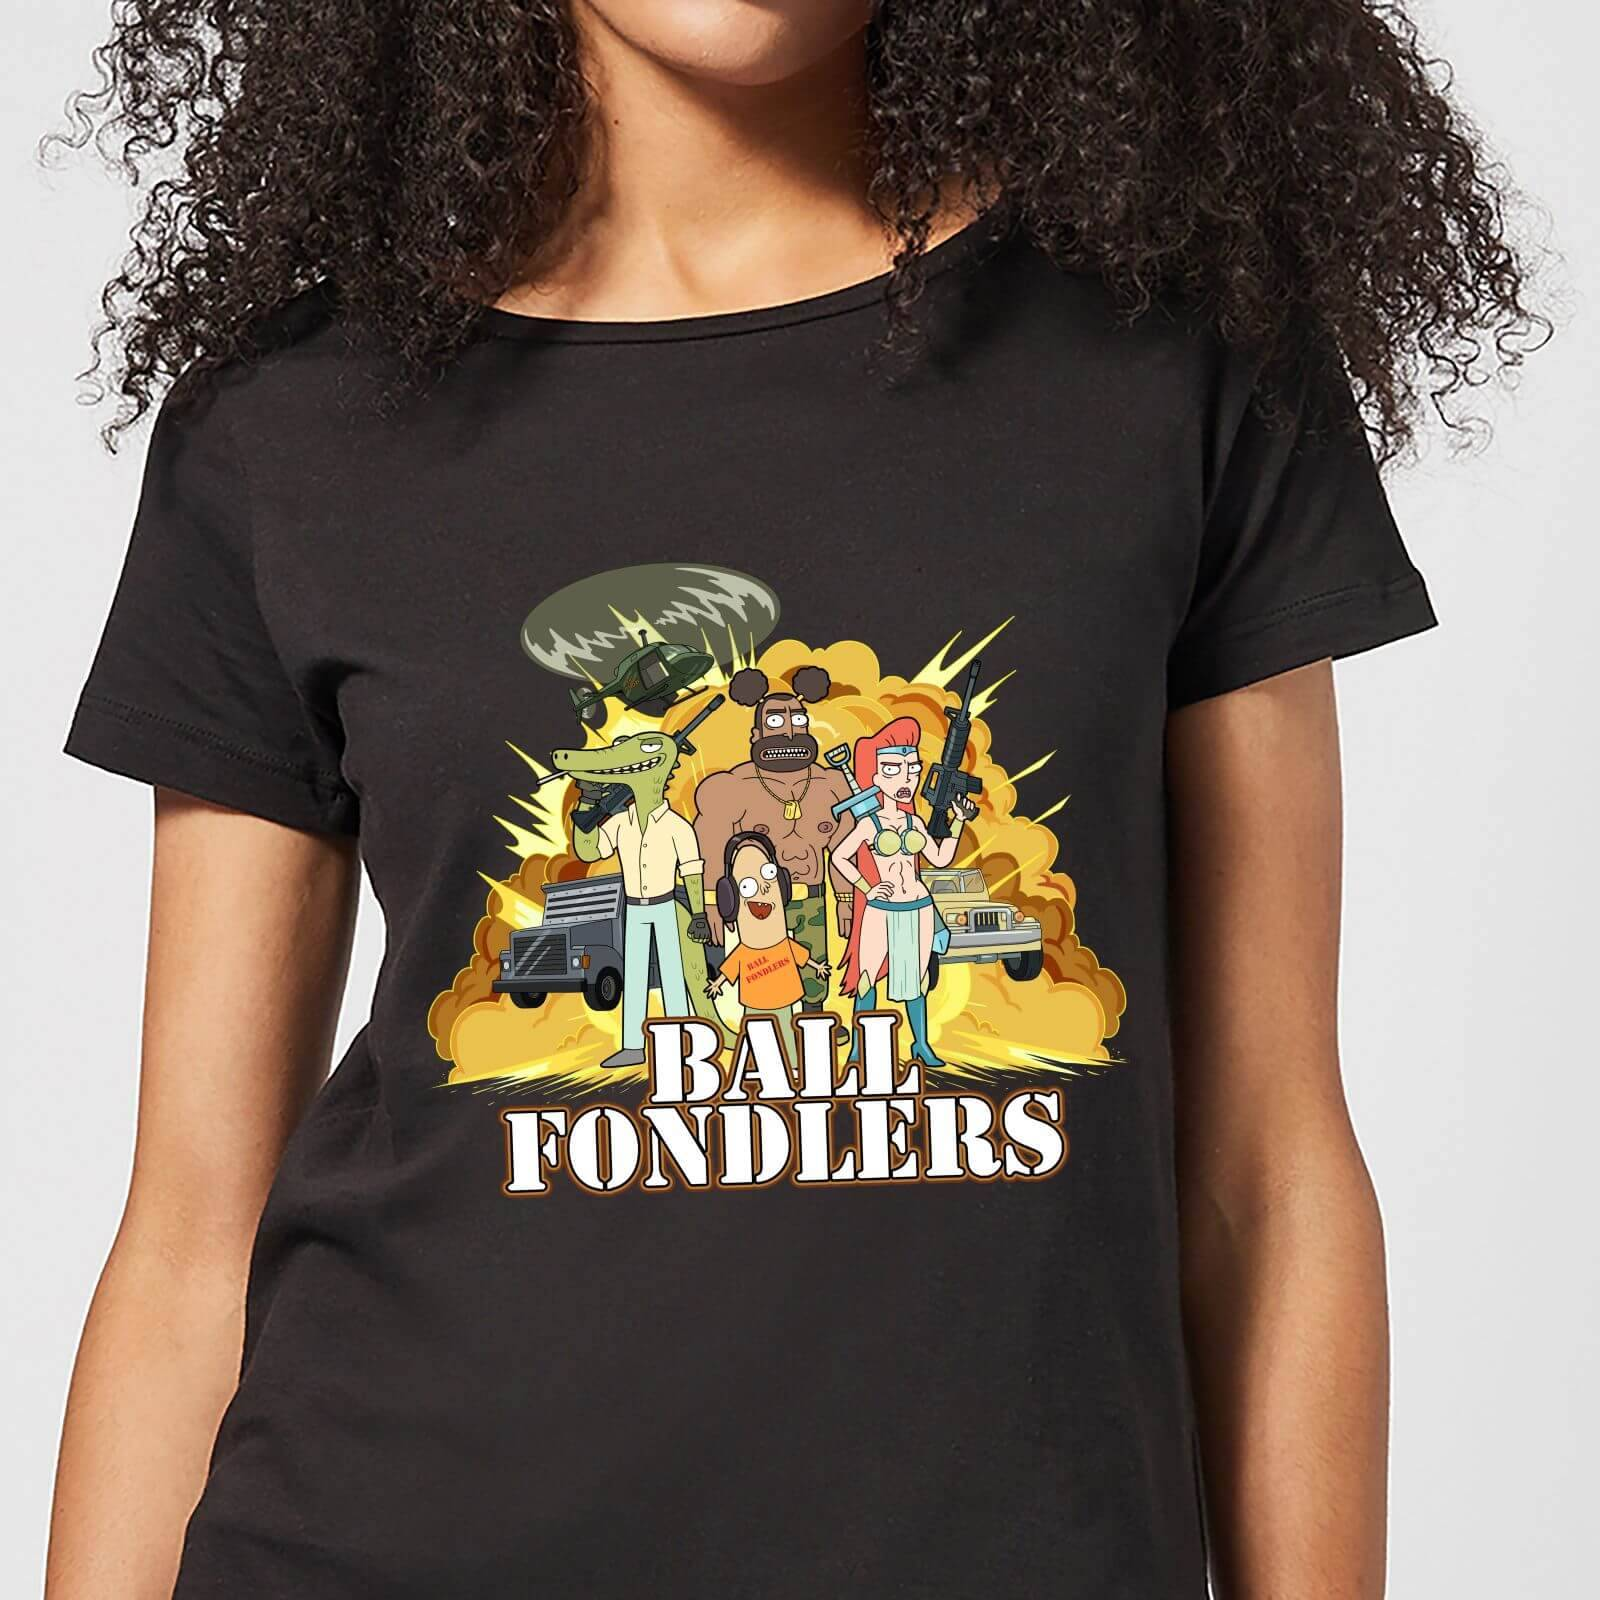 Rick and Morty Ball Fondlers Women's T-Shirt - Black - XS - Black